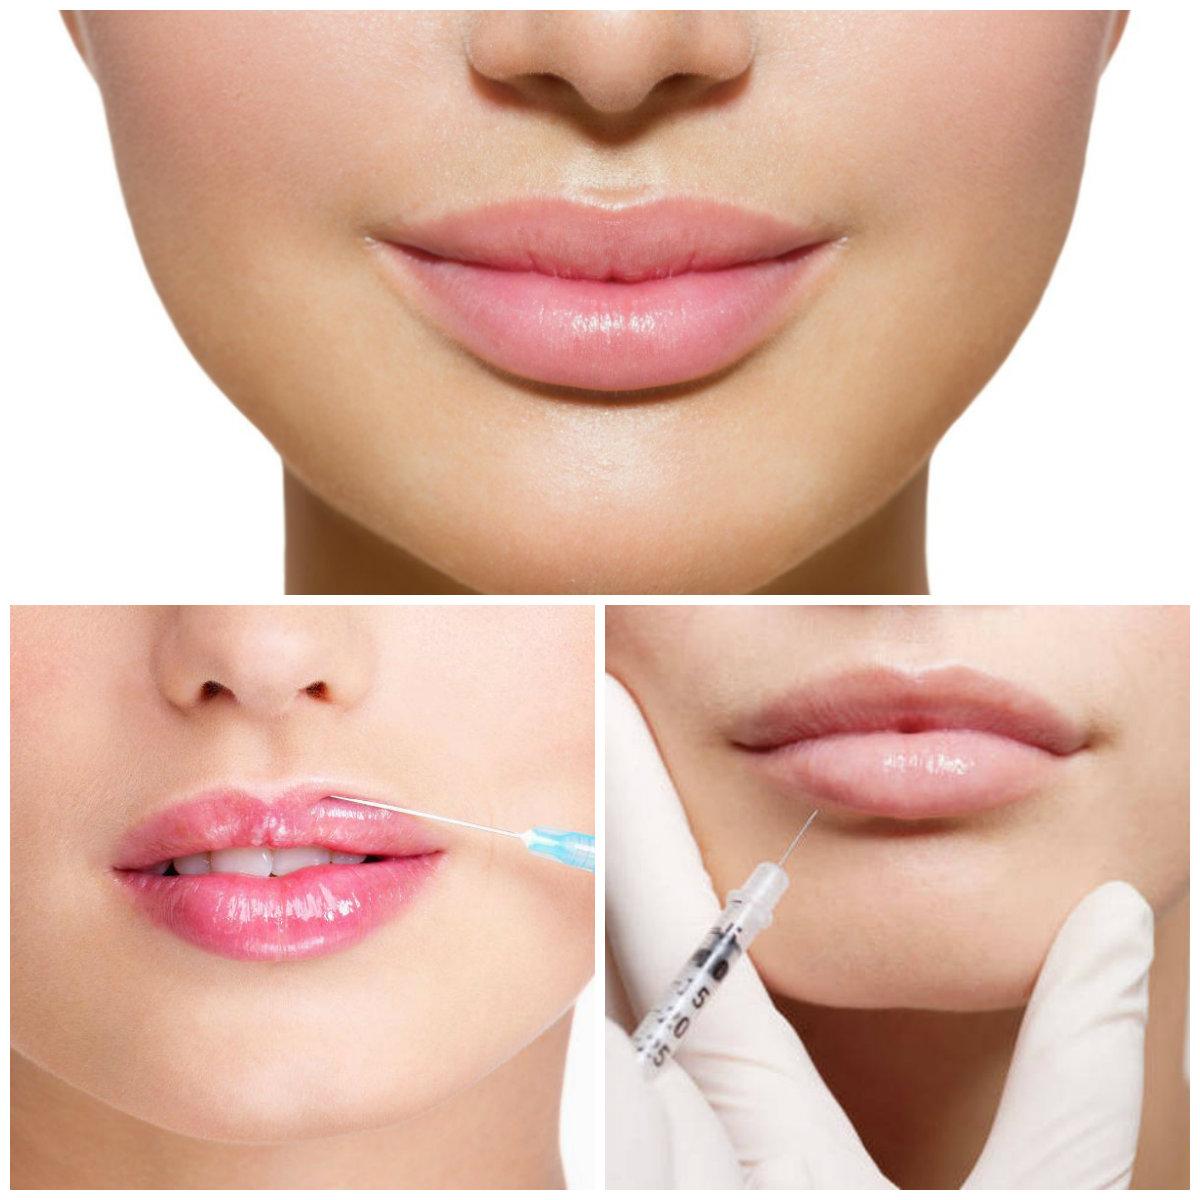 день контурная пластика губ фото меняют